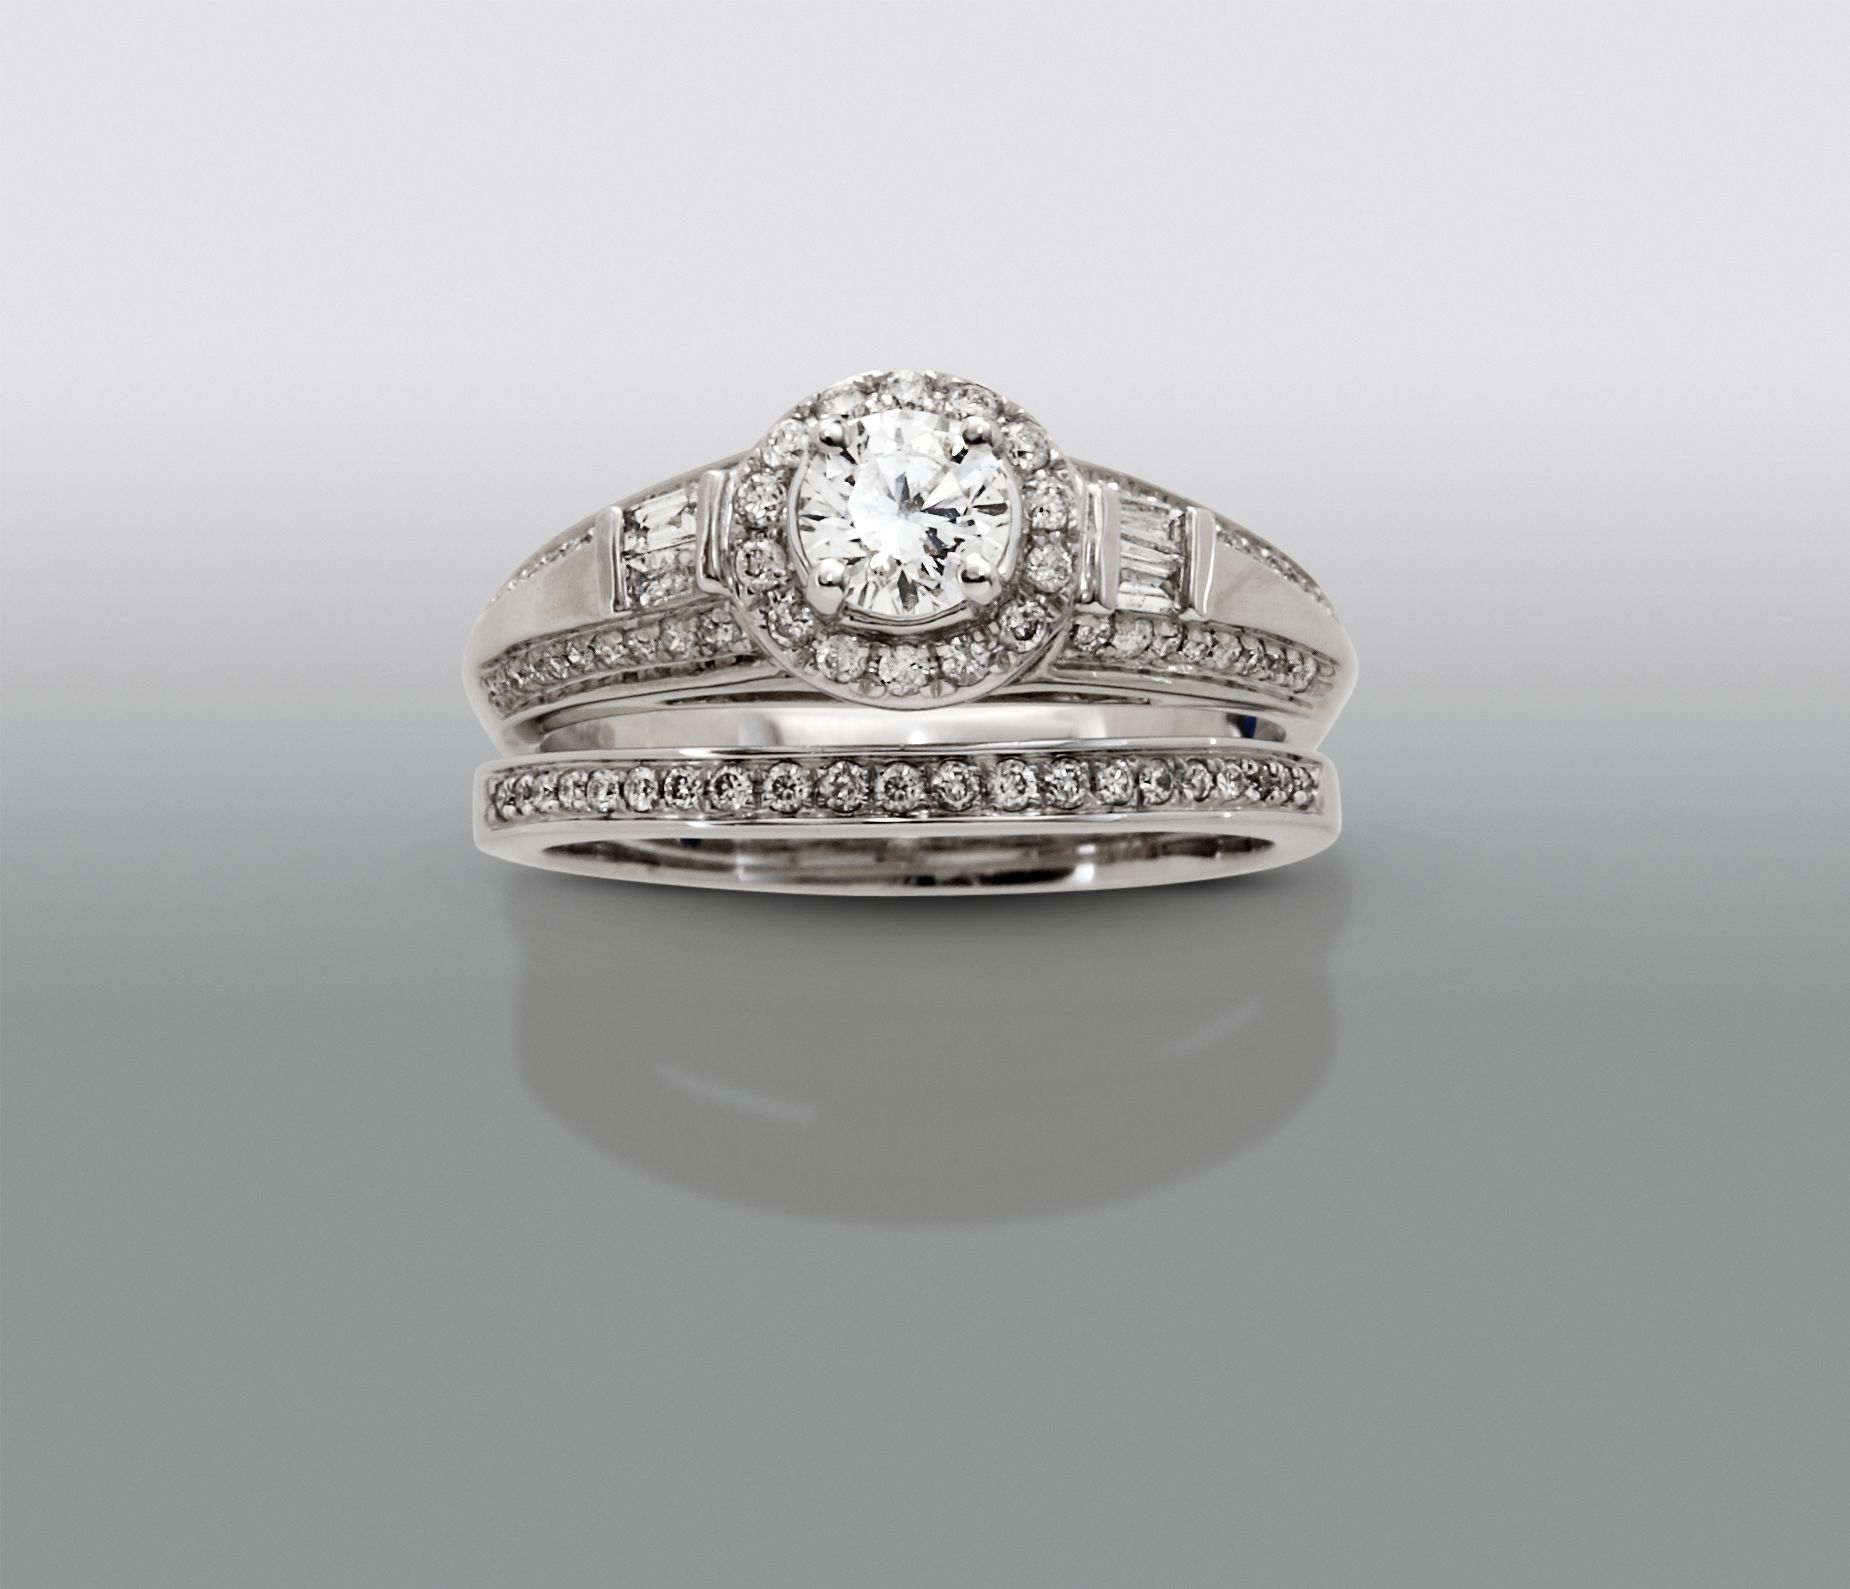 Good David Tutera 1 Cttw Certified Diamond Bridal Set 14Kt White Gold U003c3 I LOVE  WHITE